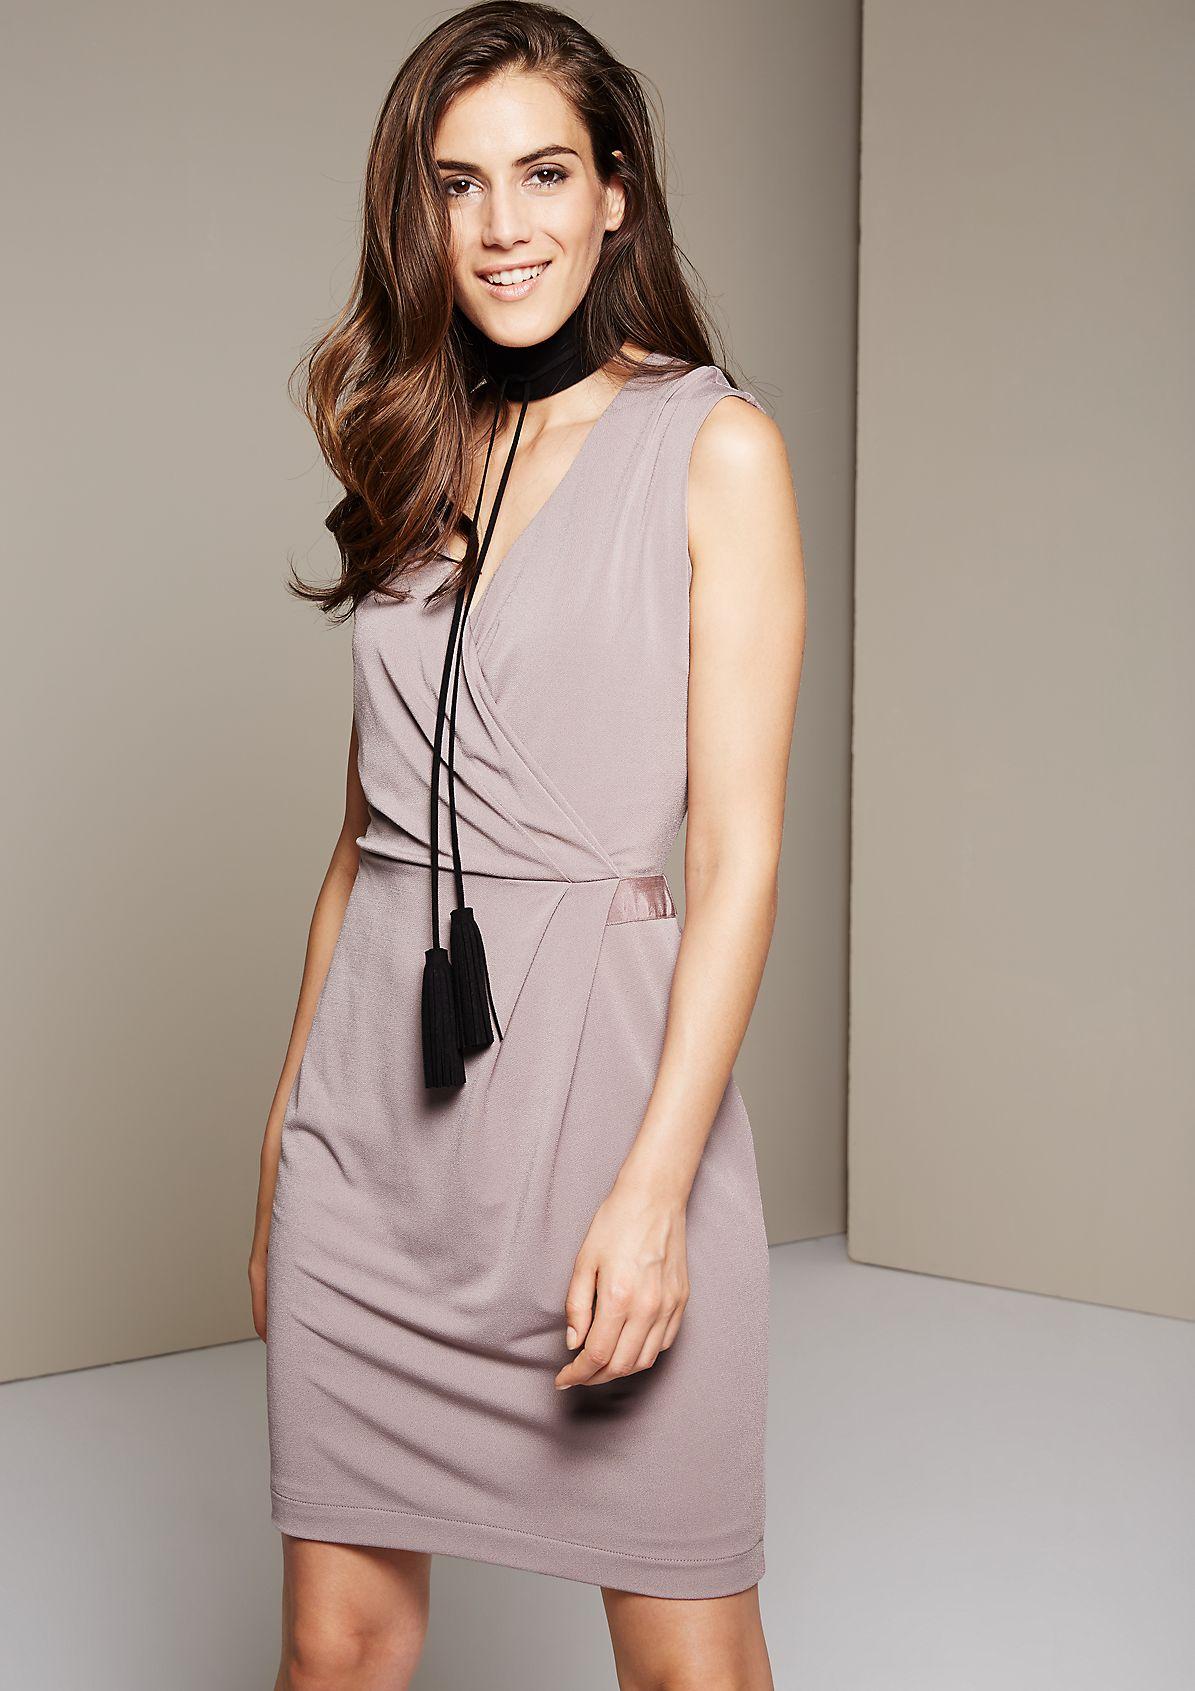 Elegant crêpe evening dress with sophisticated details from s.Oliver